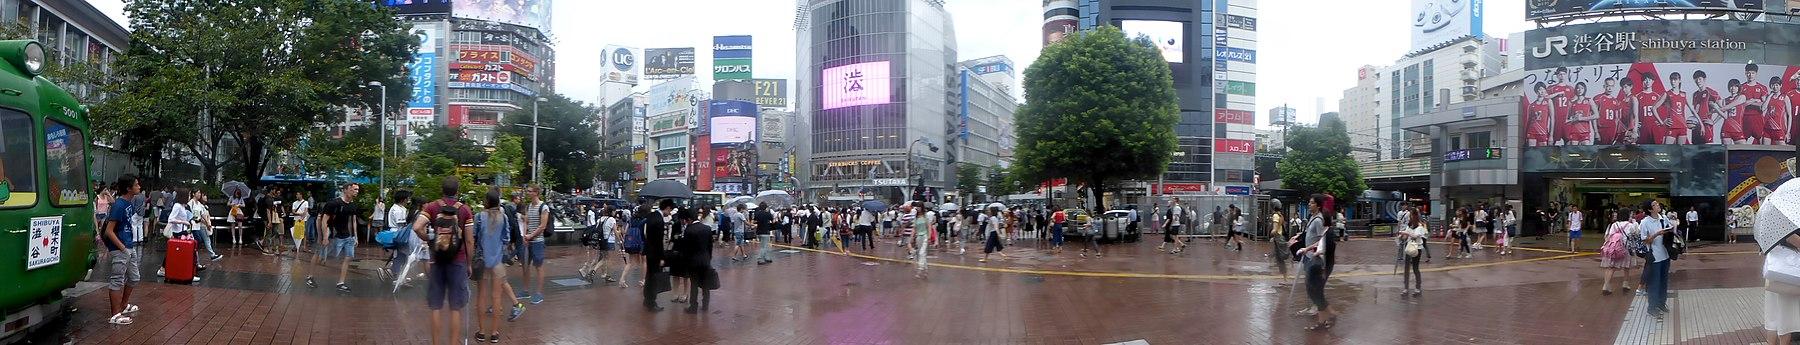 JRShibuya-Station-Hachikoexit-panorama-aug17-2015.jpg